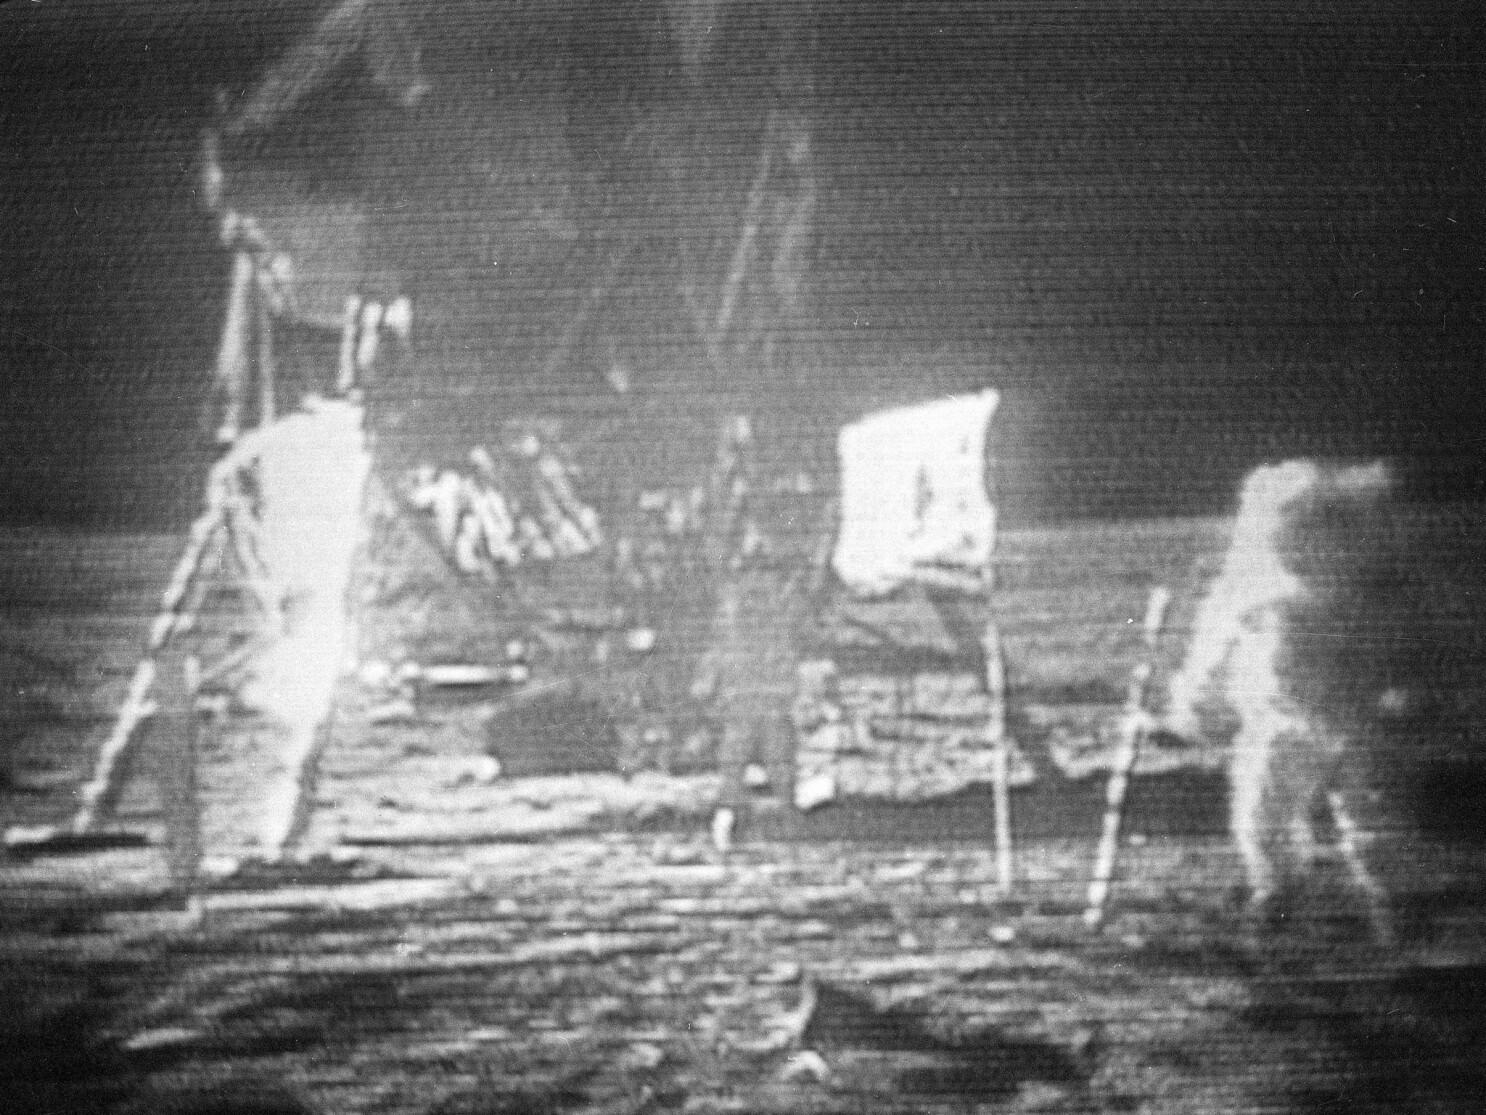 Apollo 11 moon landing: the TV show of the (half) century